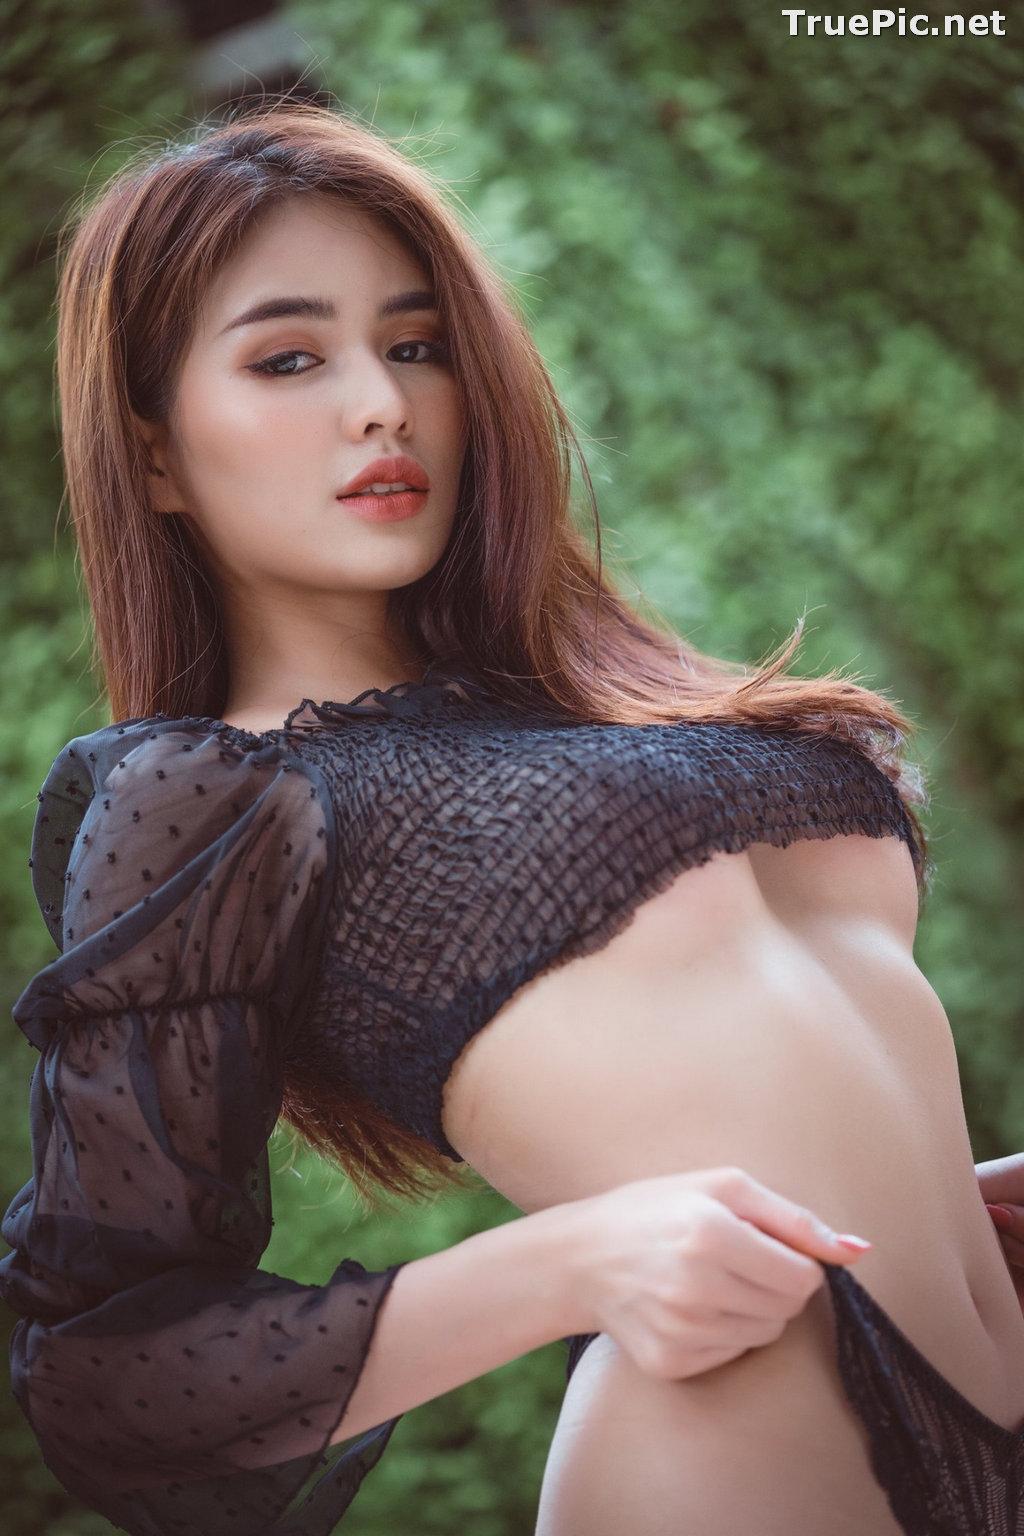 Image Thailand Model - Poompui Tarawongsatit - Beautiful Picture 2020 Collection - TruePic.net - Picture-3